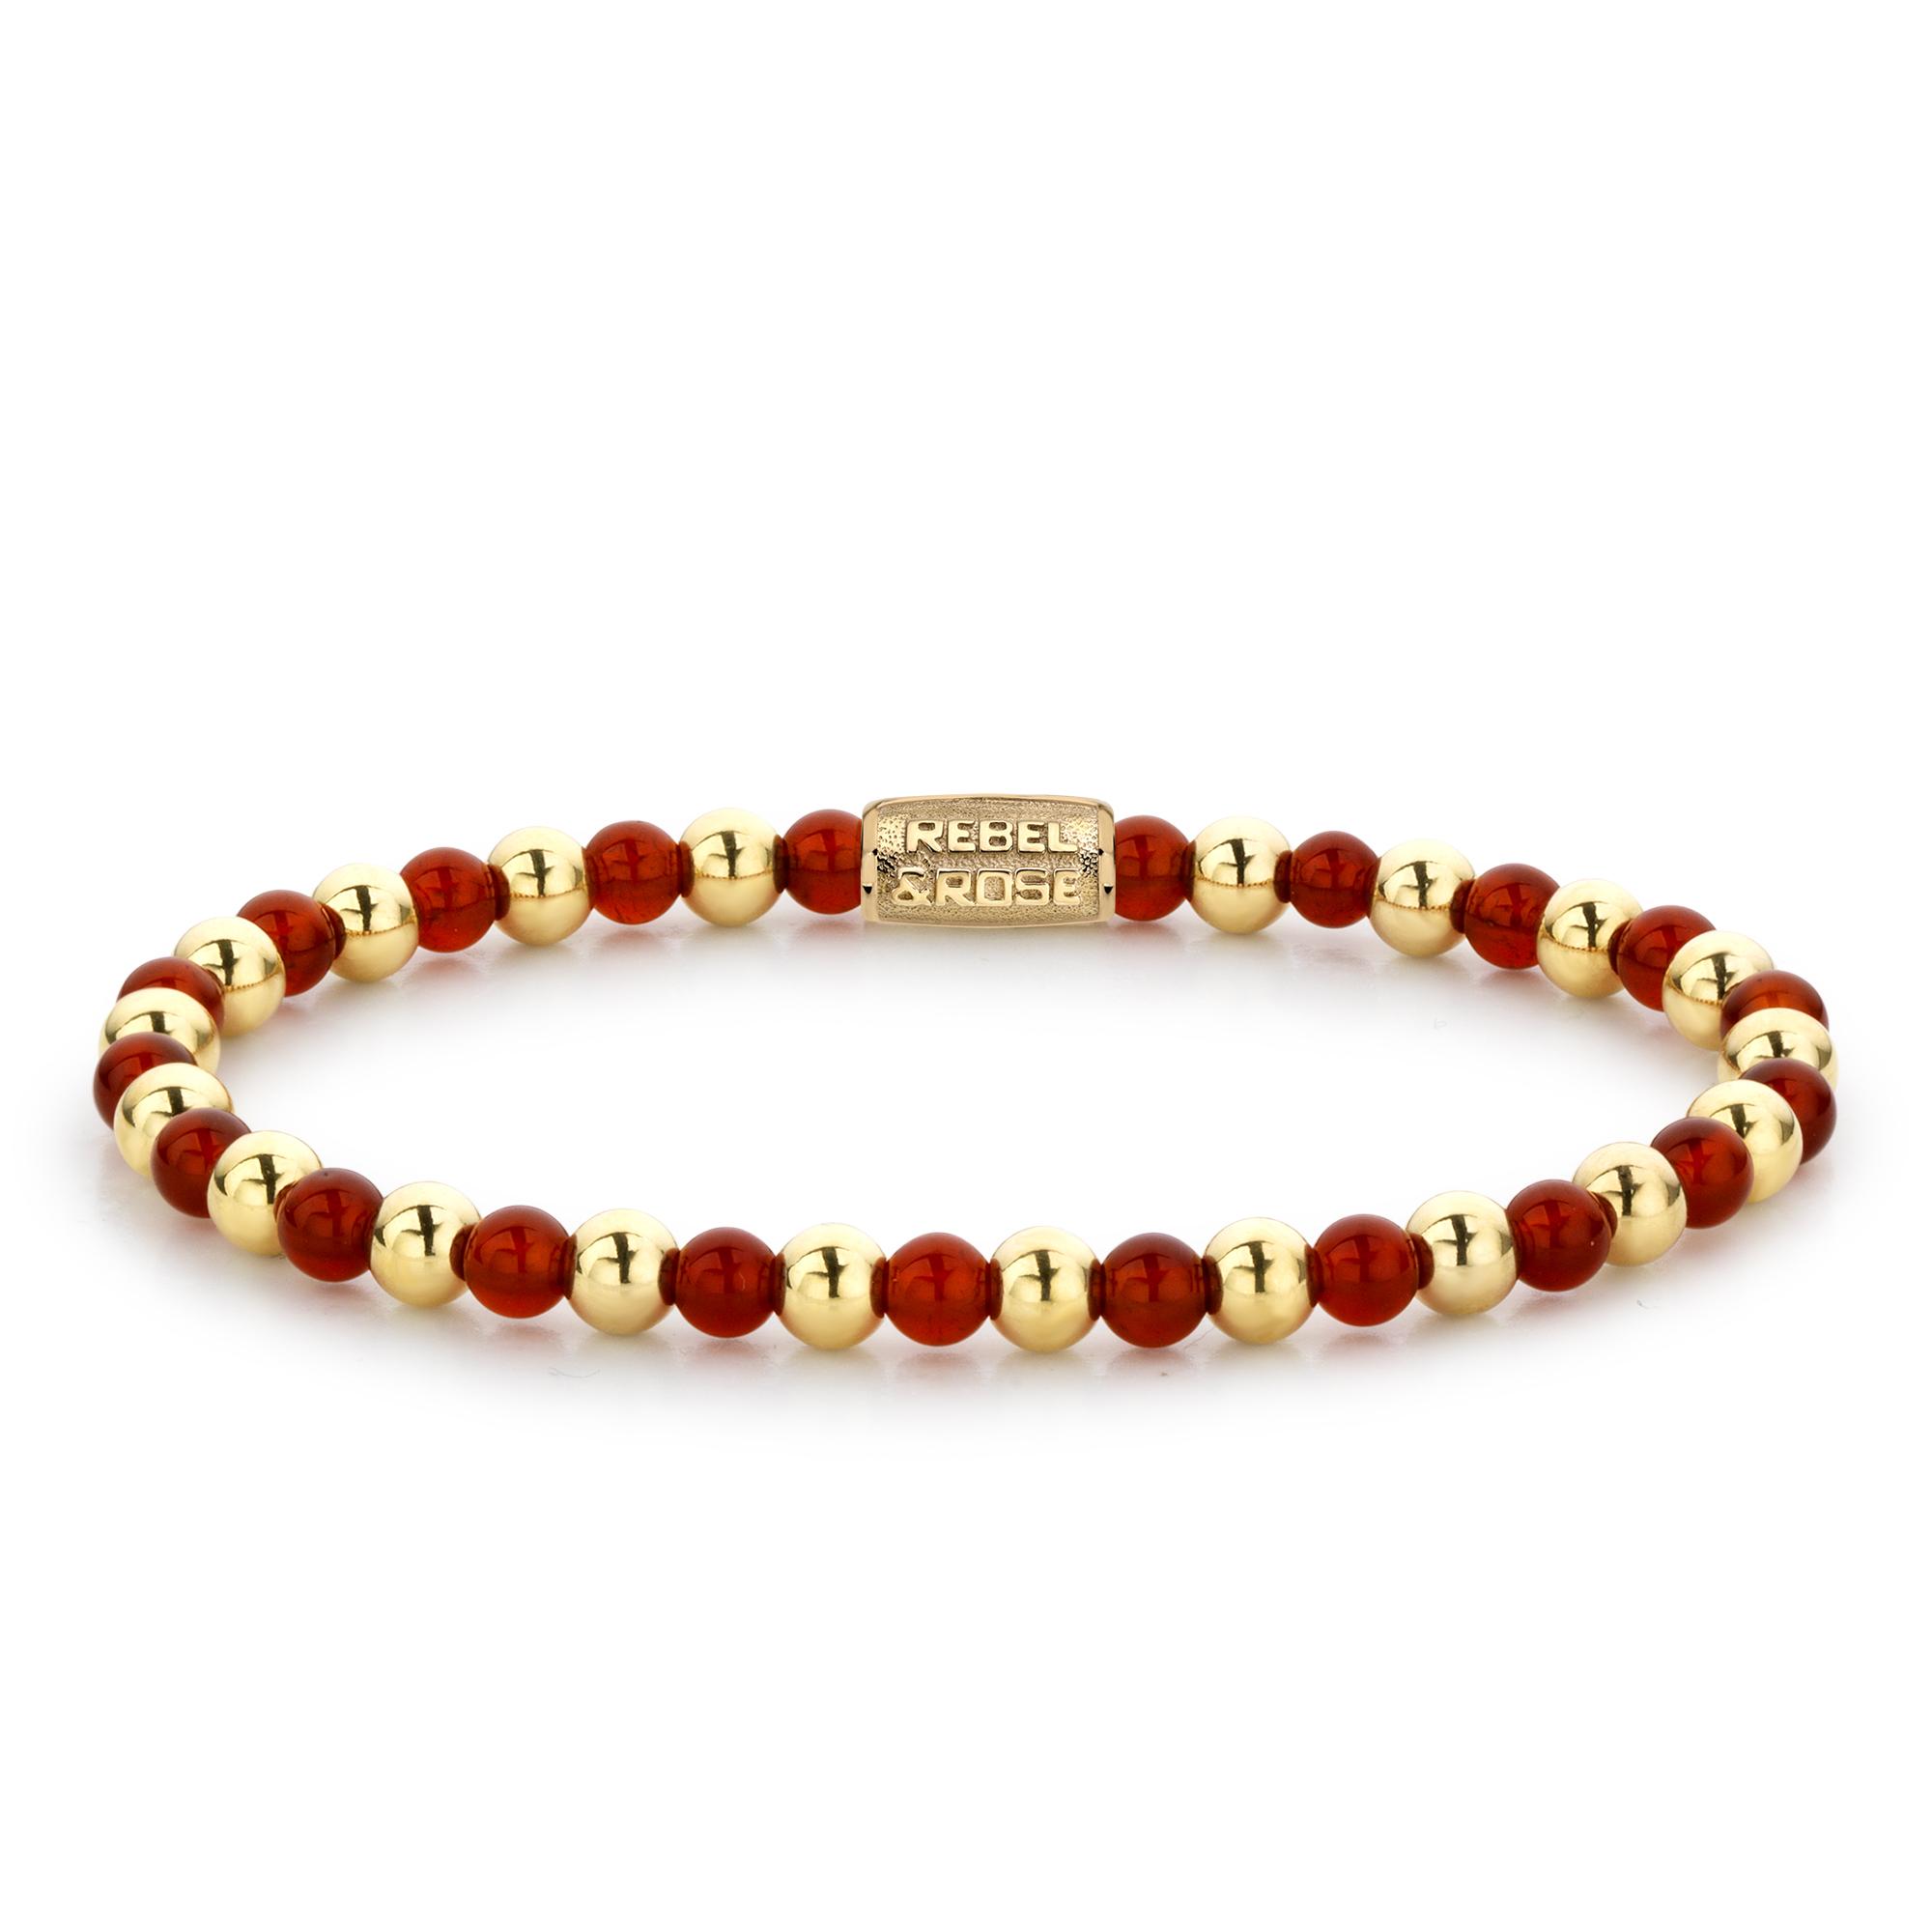 Rebel and Rose RR 40050 G Rekarmband Beads Mix Amazing Grace rood goudkleurig 4 mm XS 15 cm